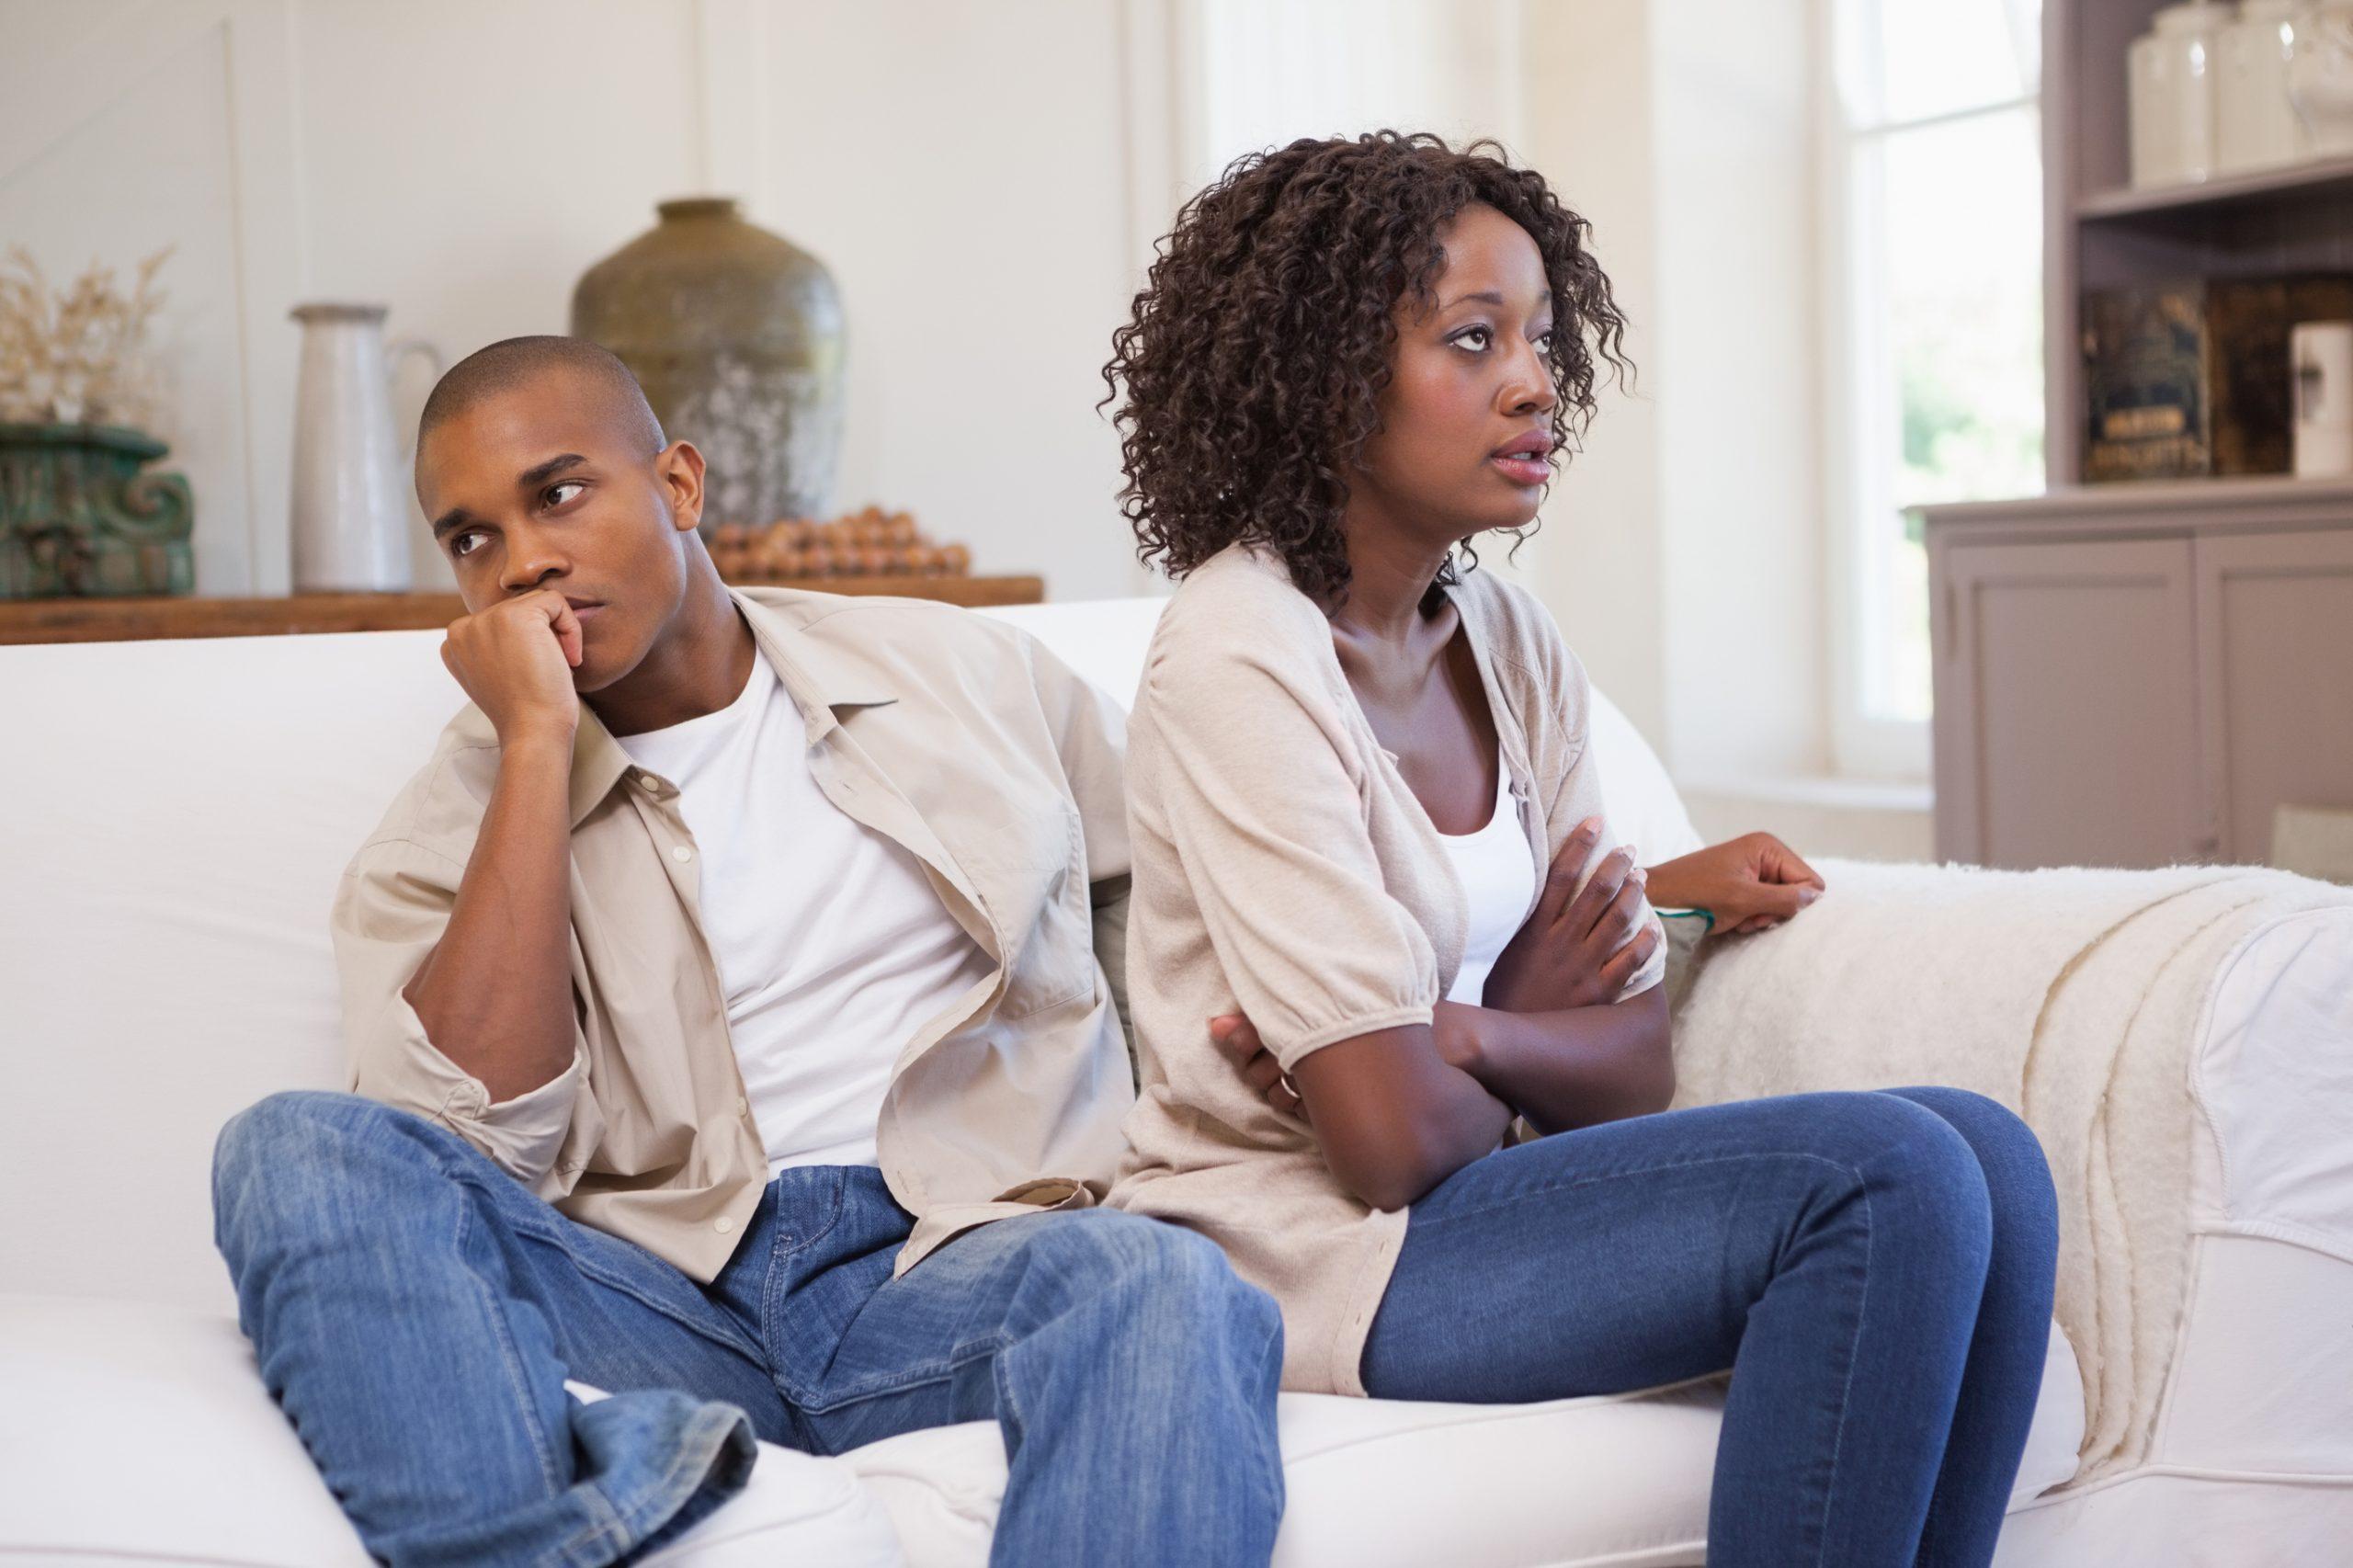 How To Win Back Ex Despite the Incompatibility